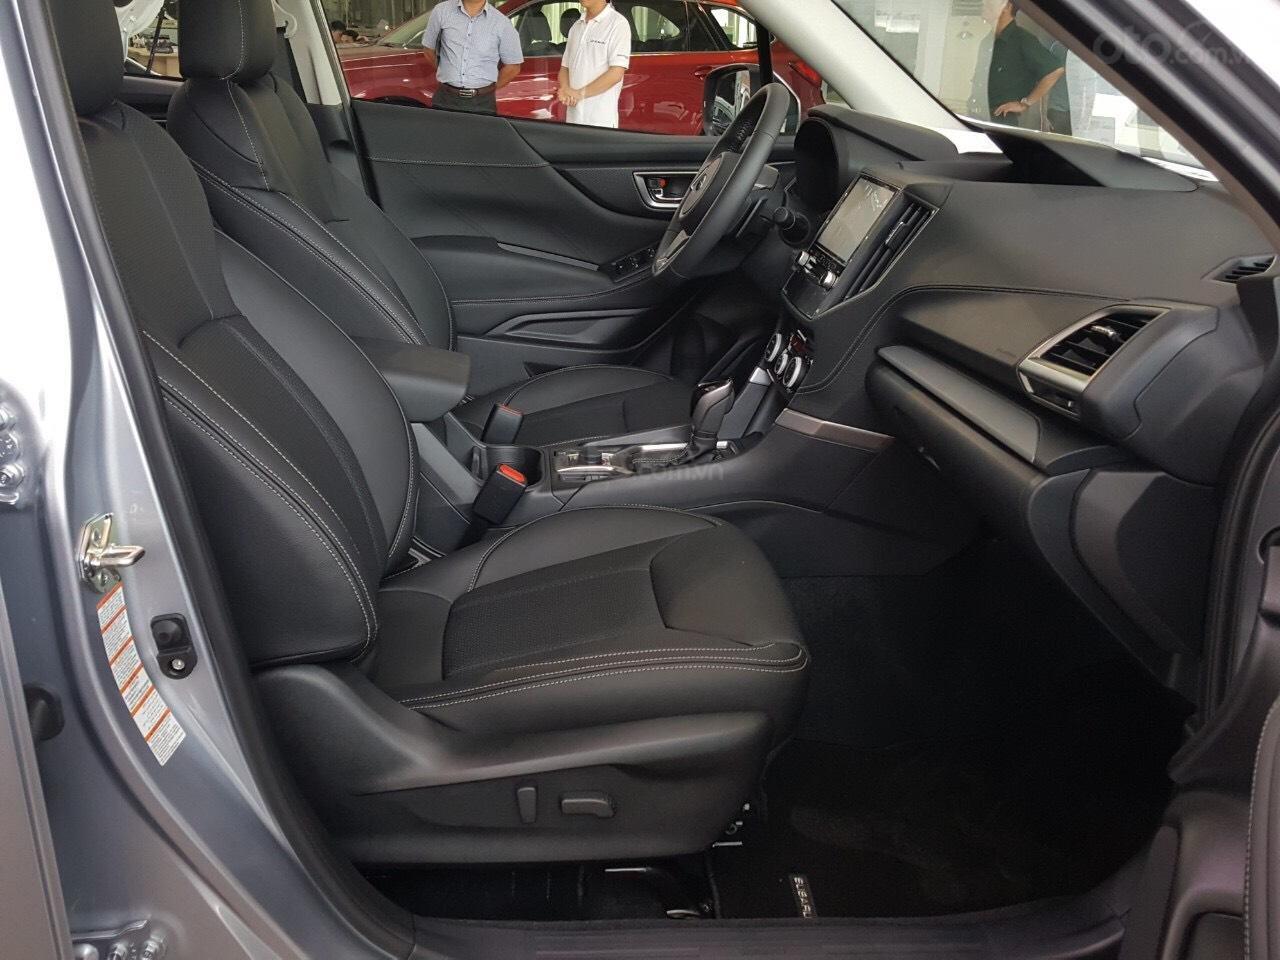 Bán Subaru Forester 2.0 IL, giảm TM trên 100tr, gọi 093.22222.30 Ms Loan (5)